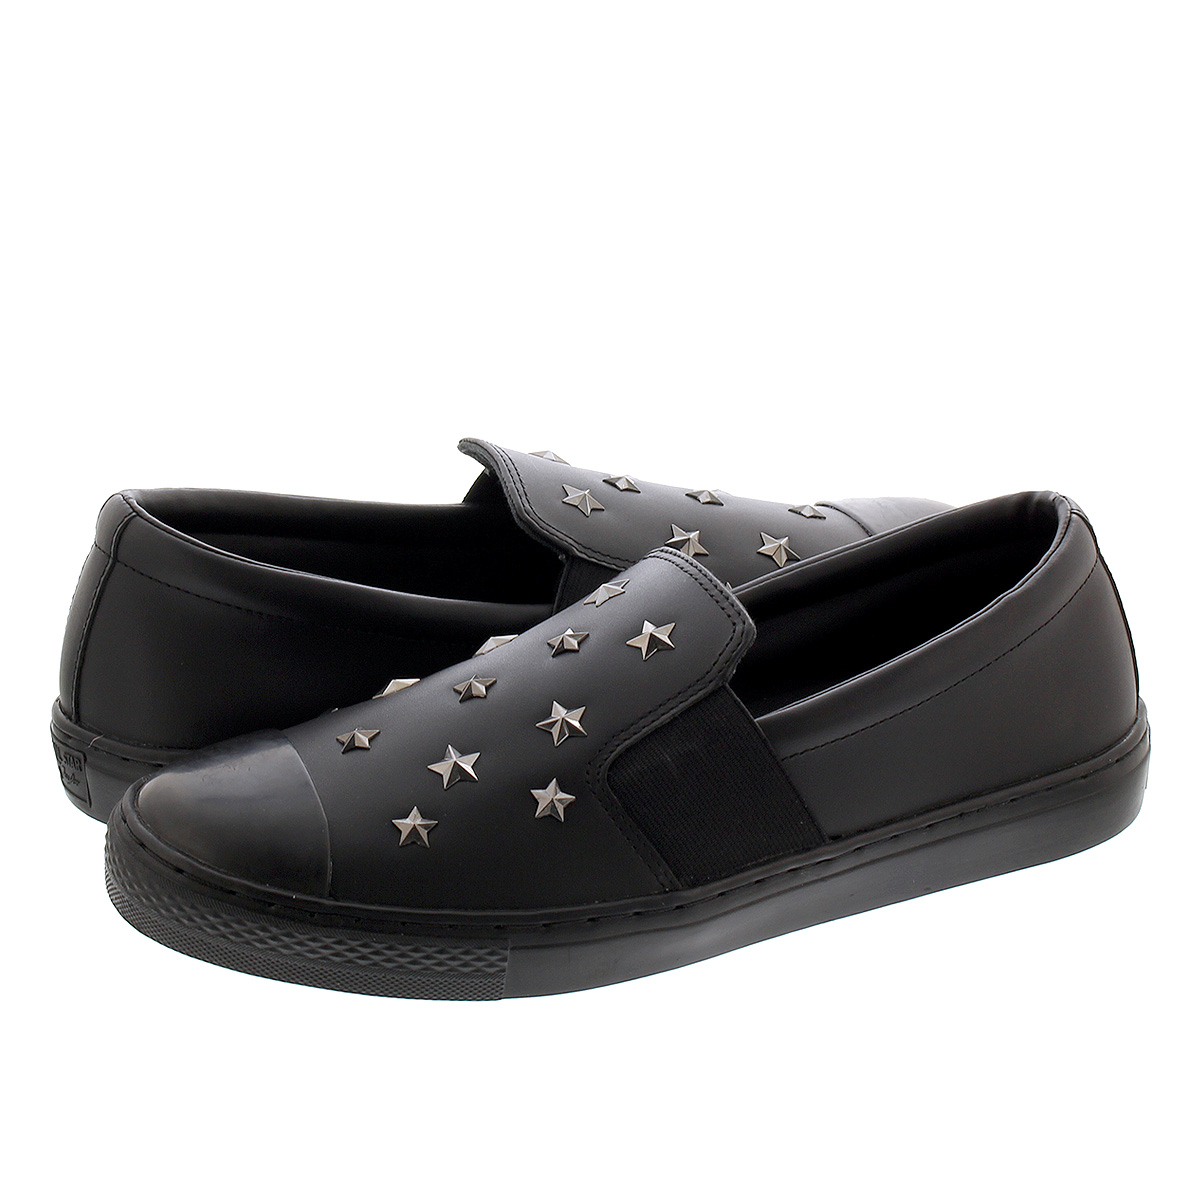 CONVERSE ALL STAR COUPE STARS SLIP-ON コンバース レザー オールスター クップ スターズ スリップオン BLACK 31301750